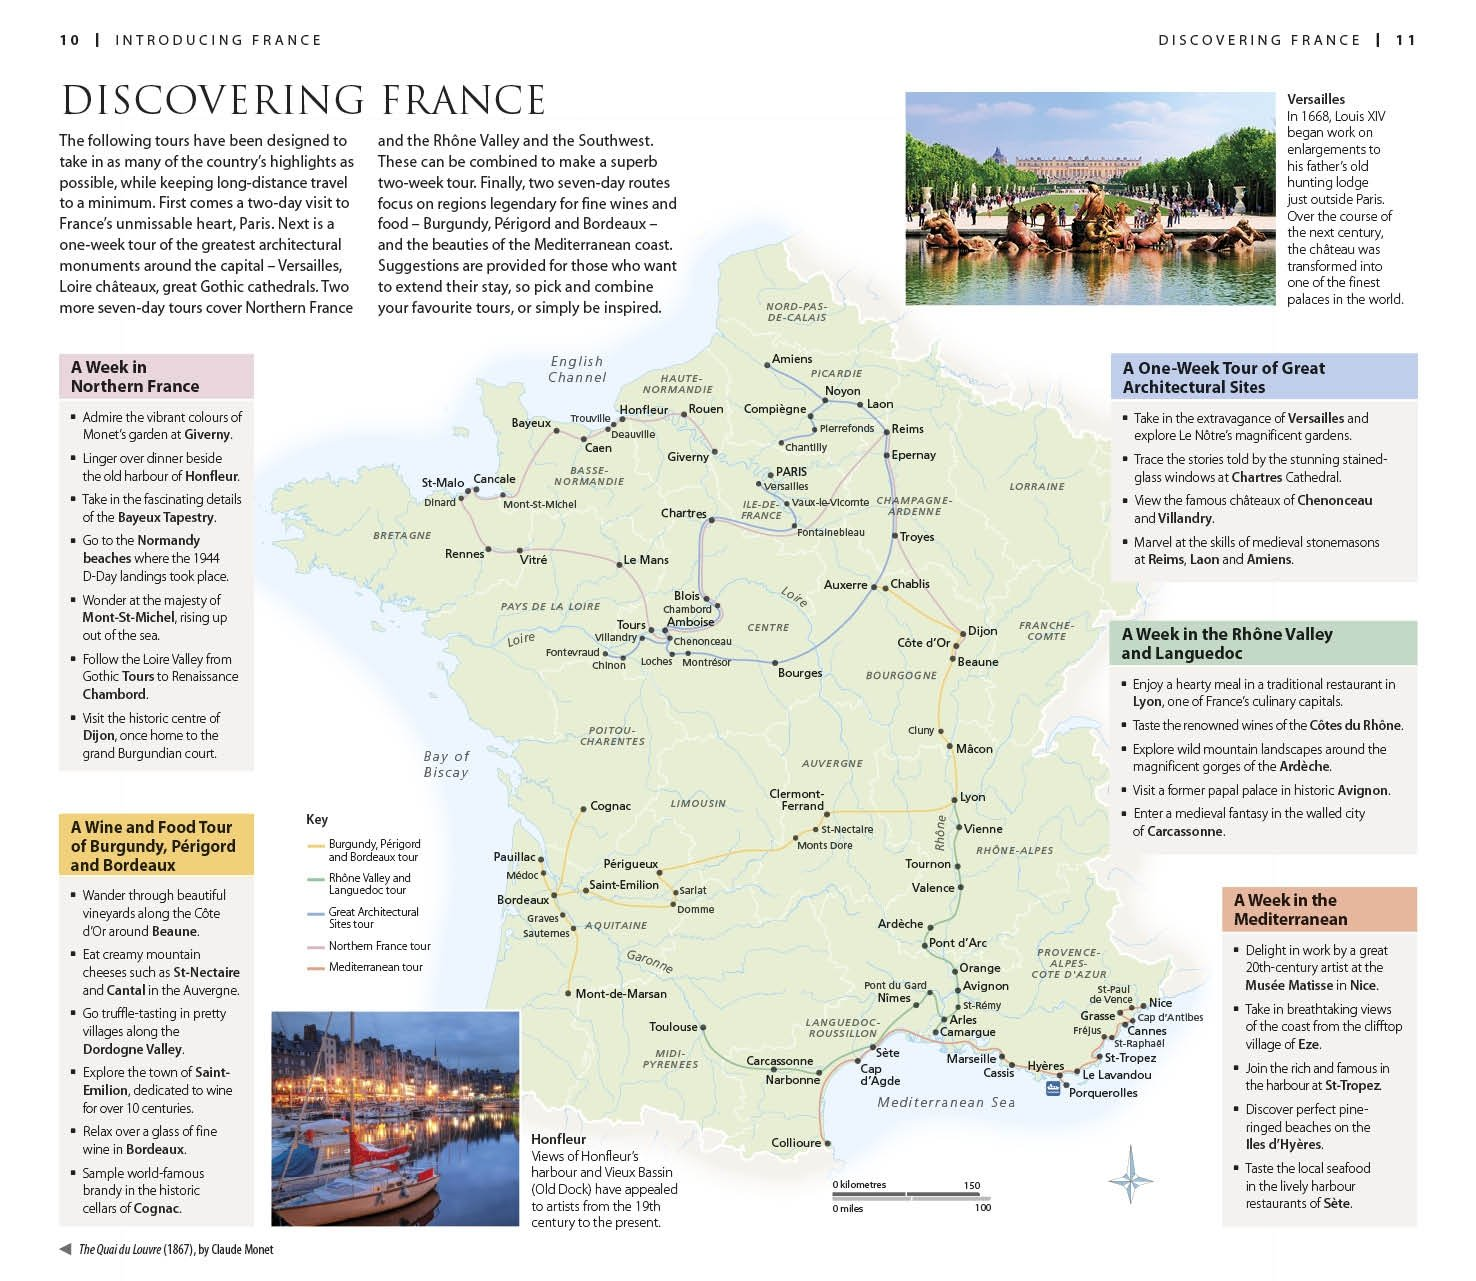 France Eyewitness Travel Guide Eyewitness Travel Guides Idioma Inglés: Amazon.es: Vv.Aa, Vv.Aa: Libros en idiomas extranjeros